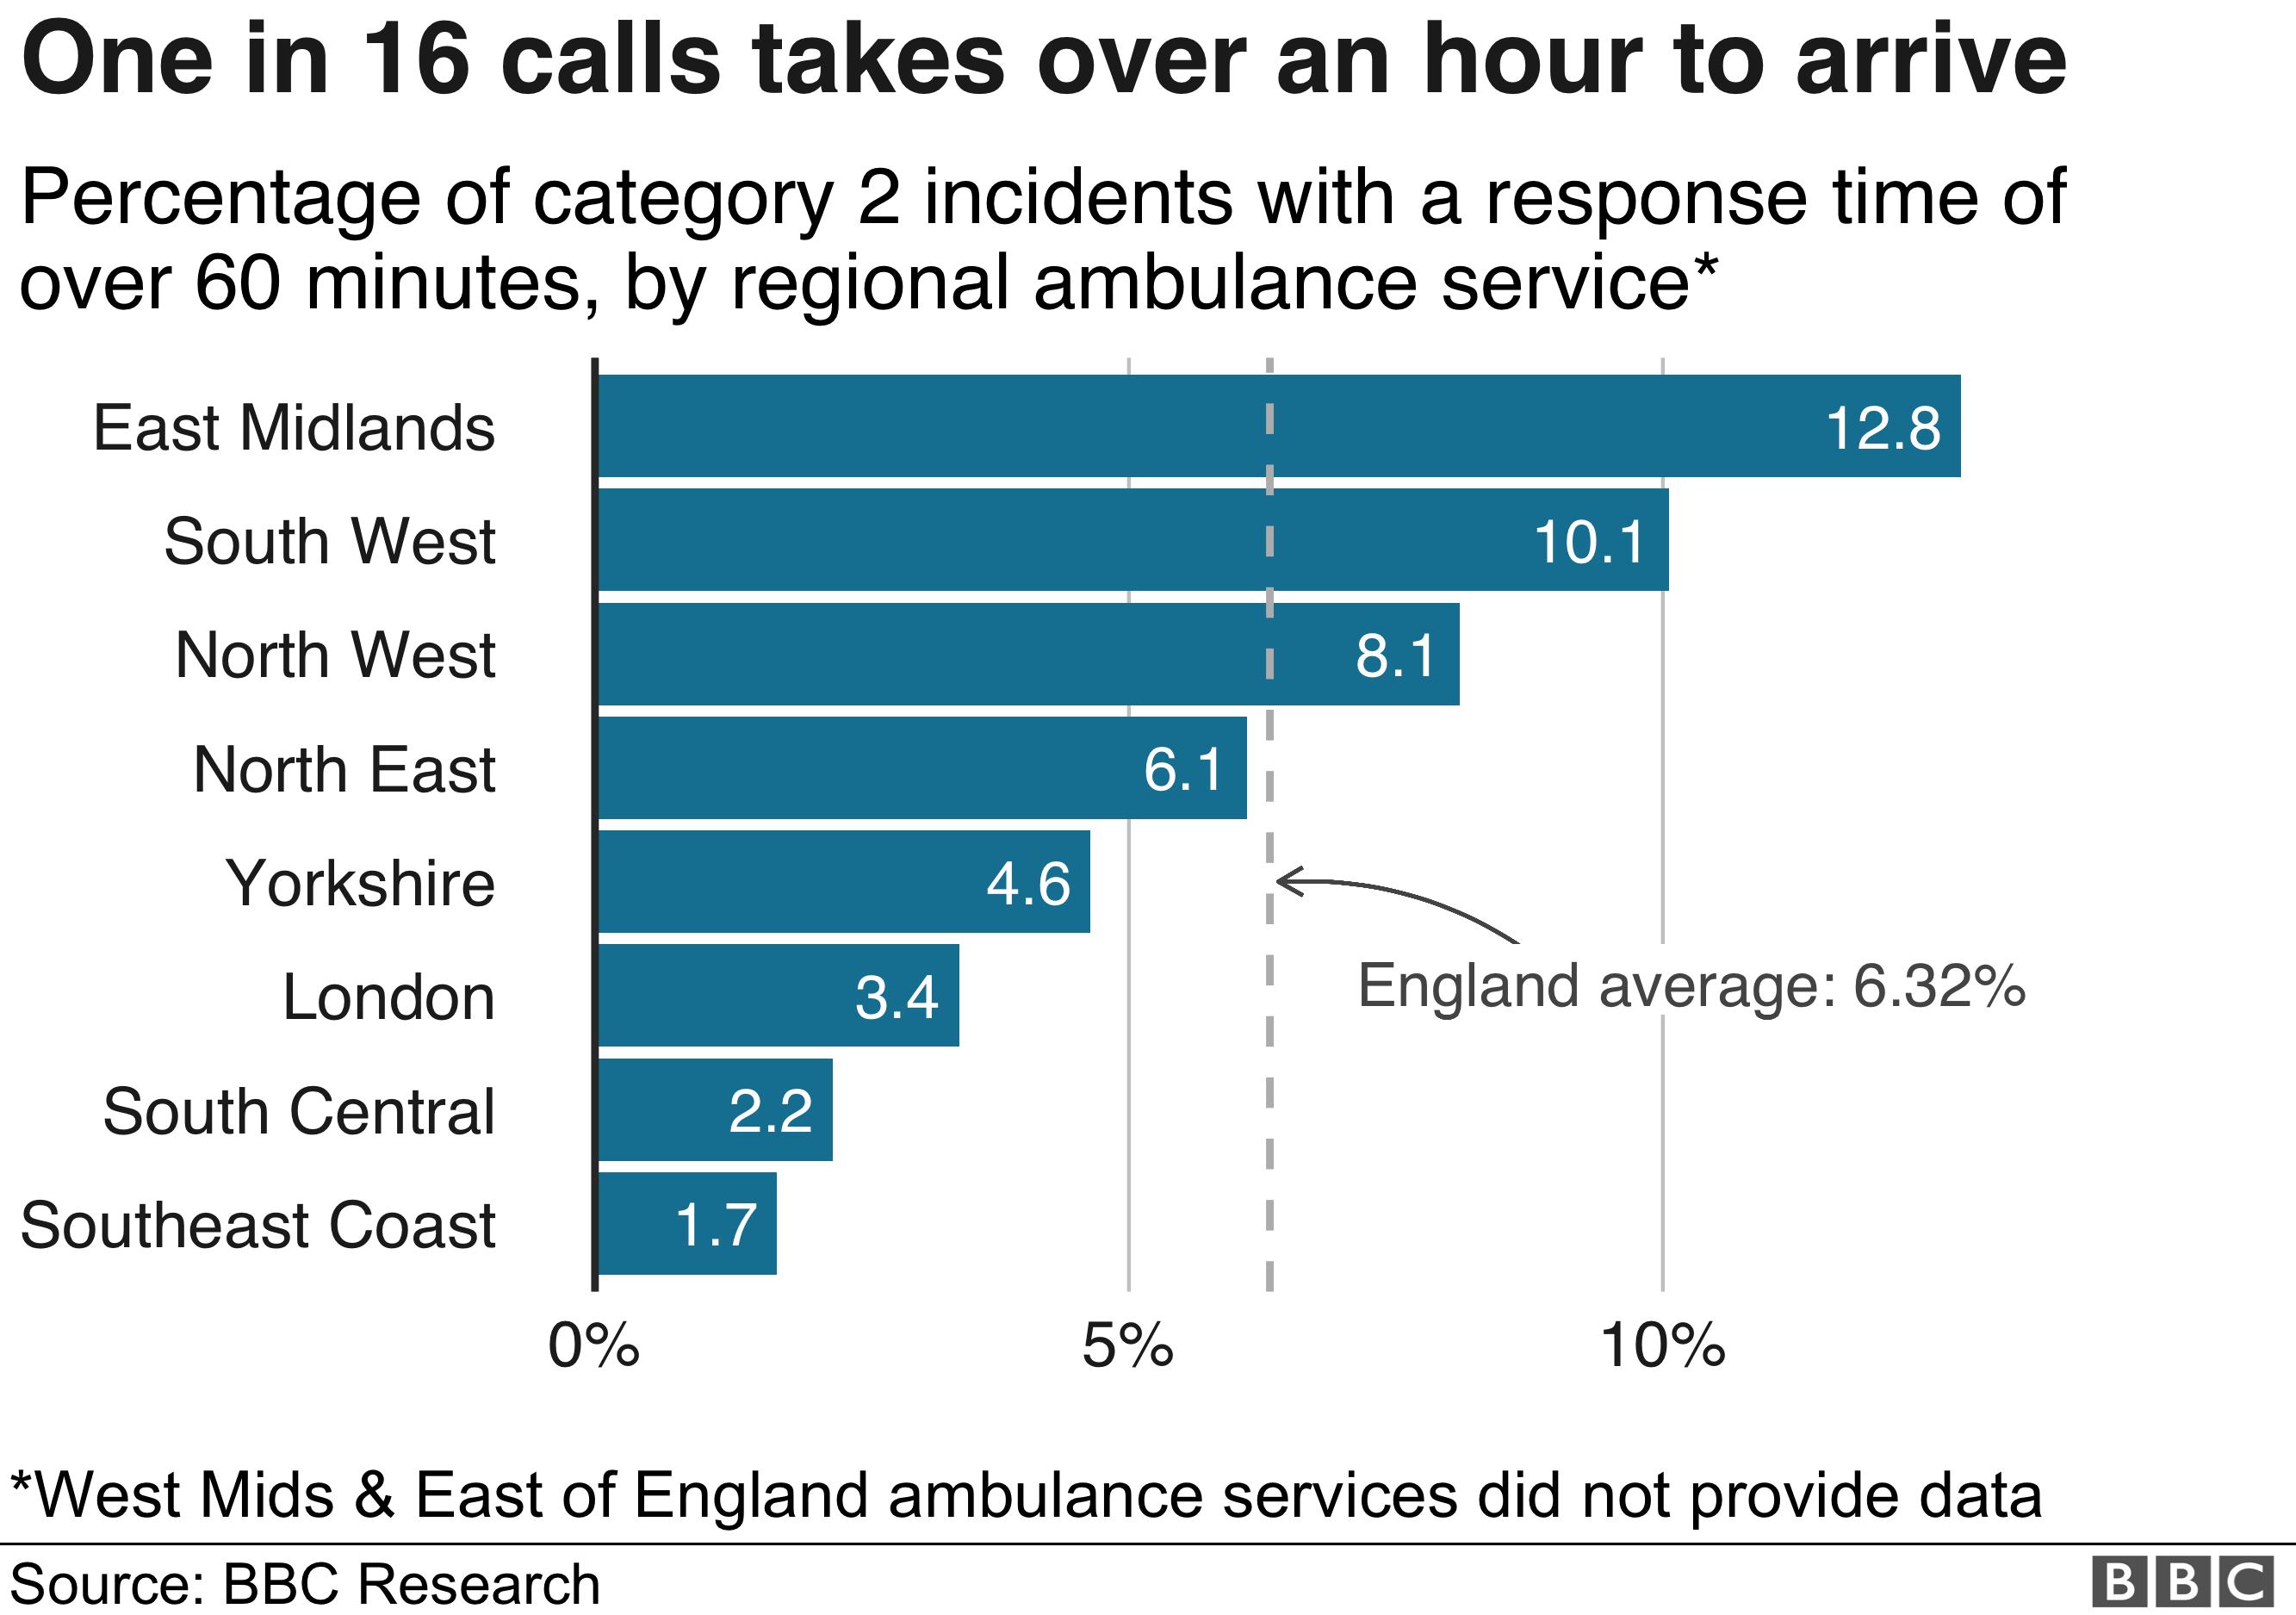 Chart showing regional ambulance performance